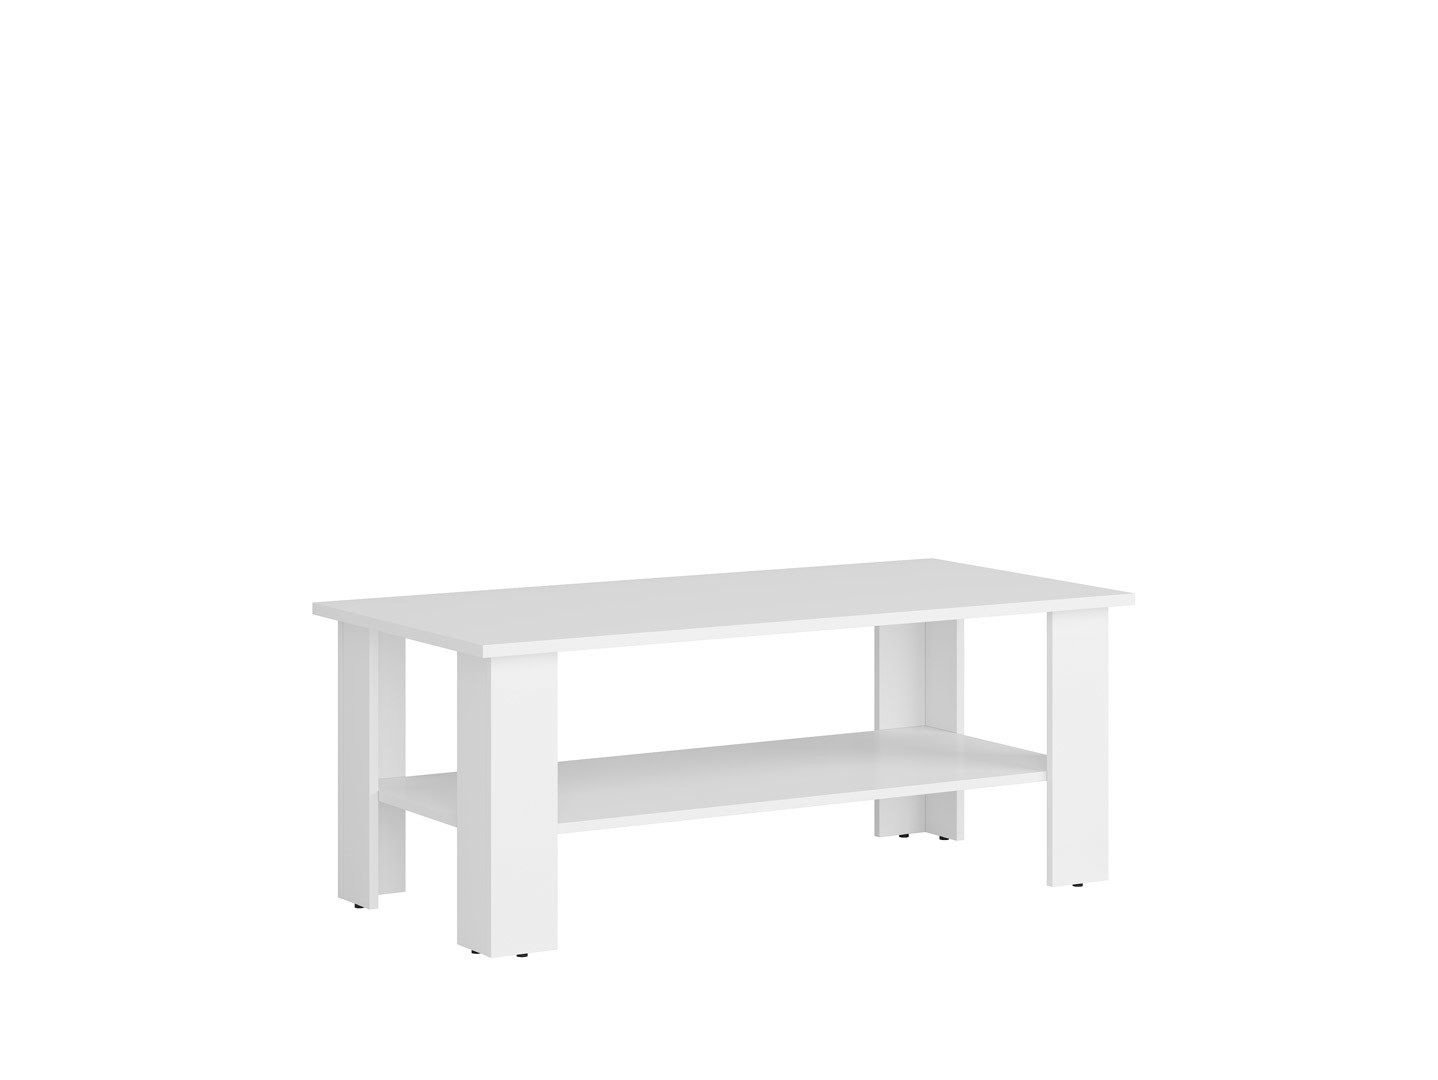 Konferenčný stolík NEPO PLUS LAW/115 biely